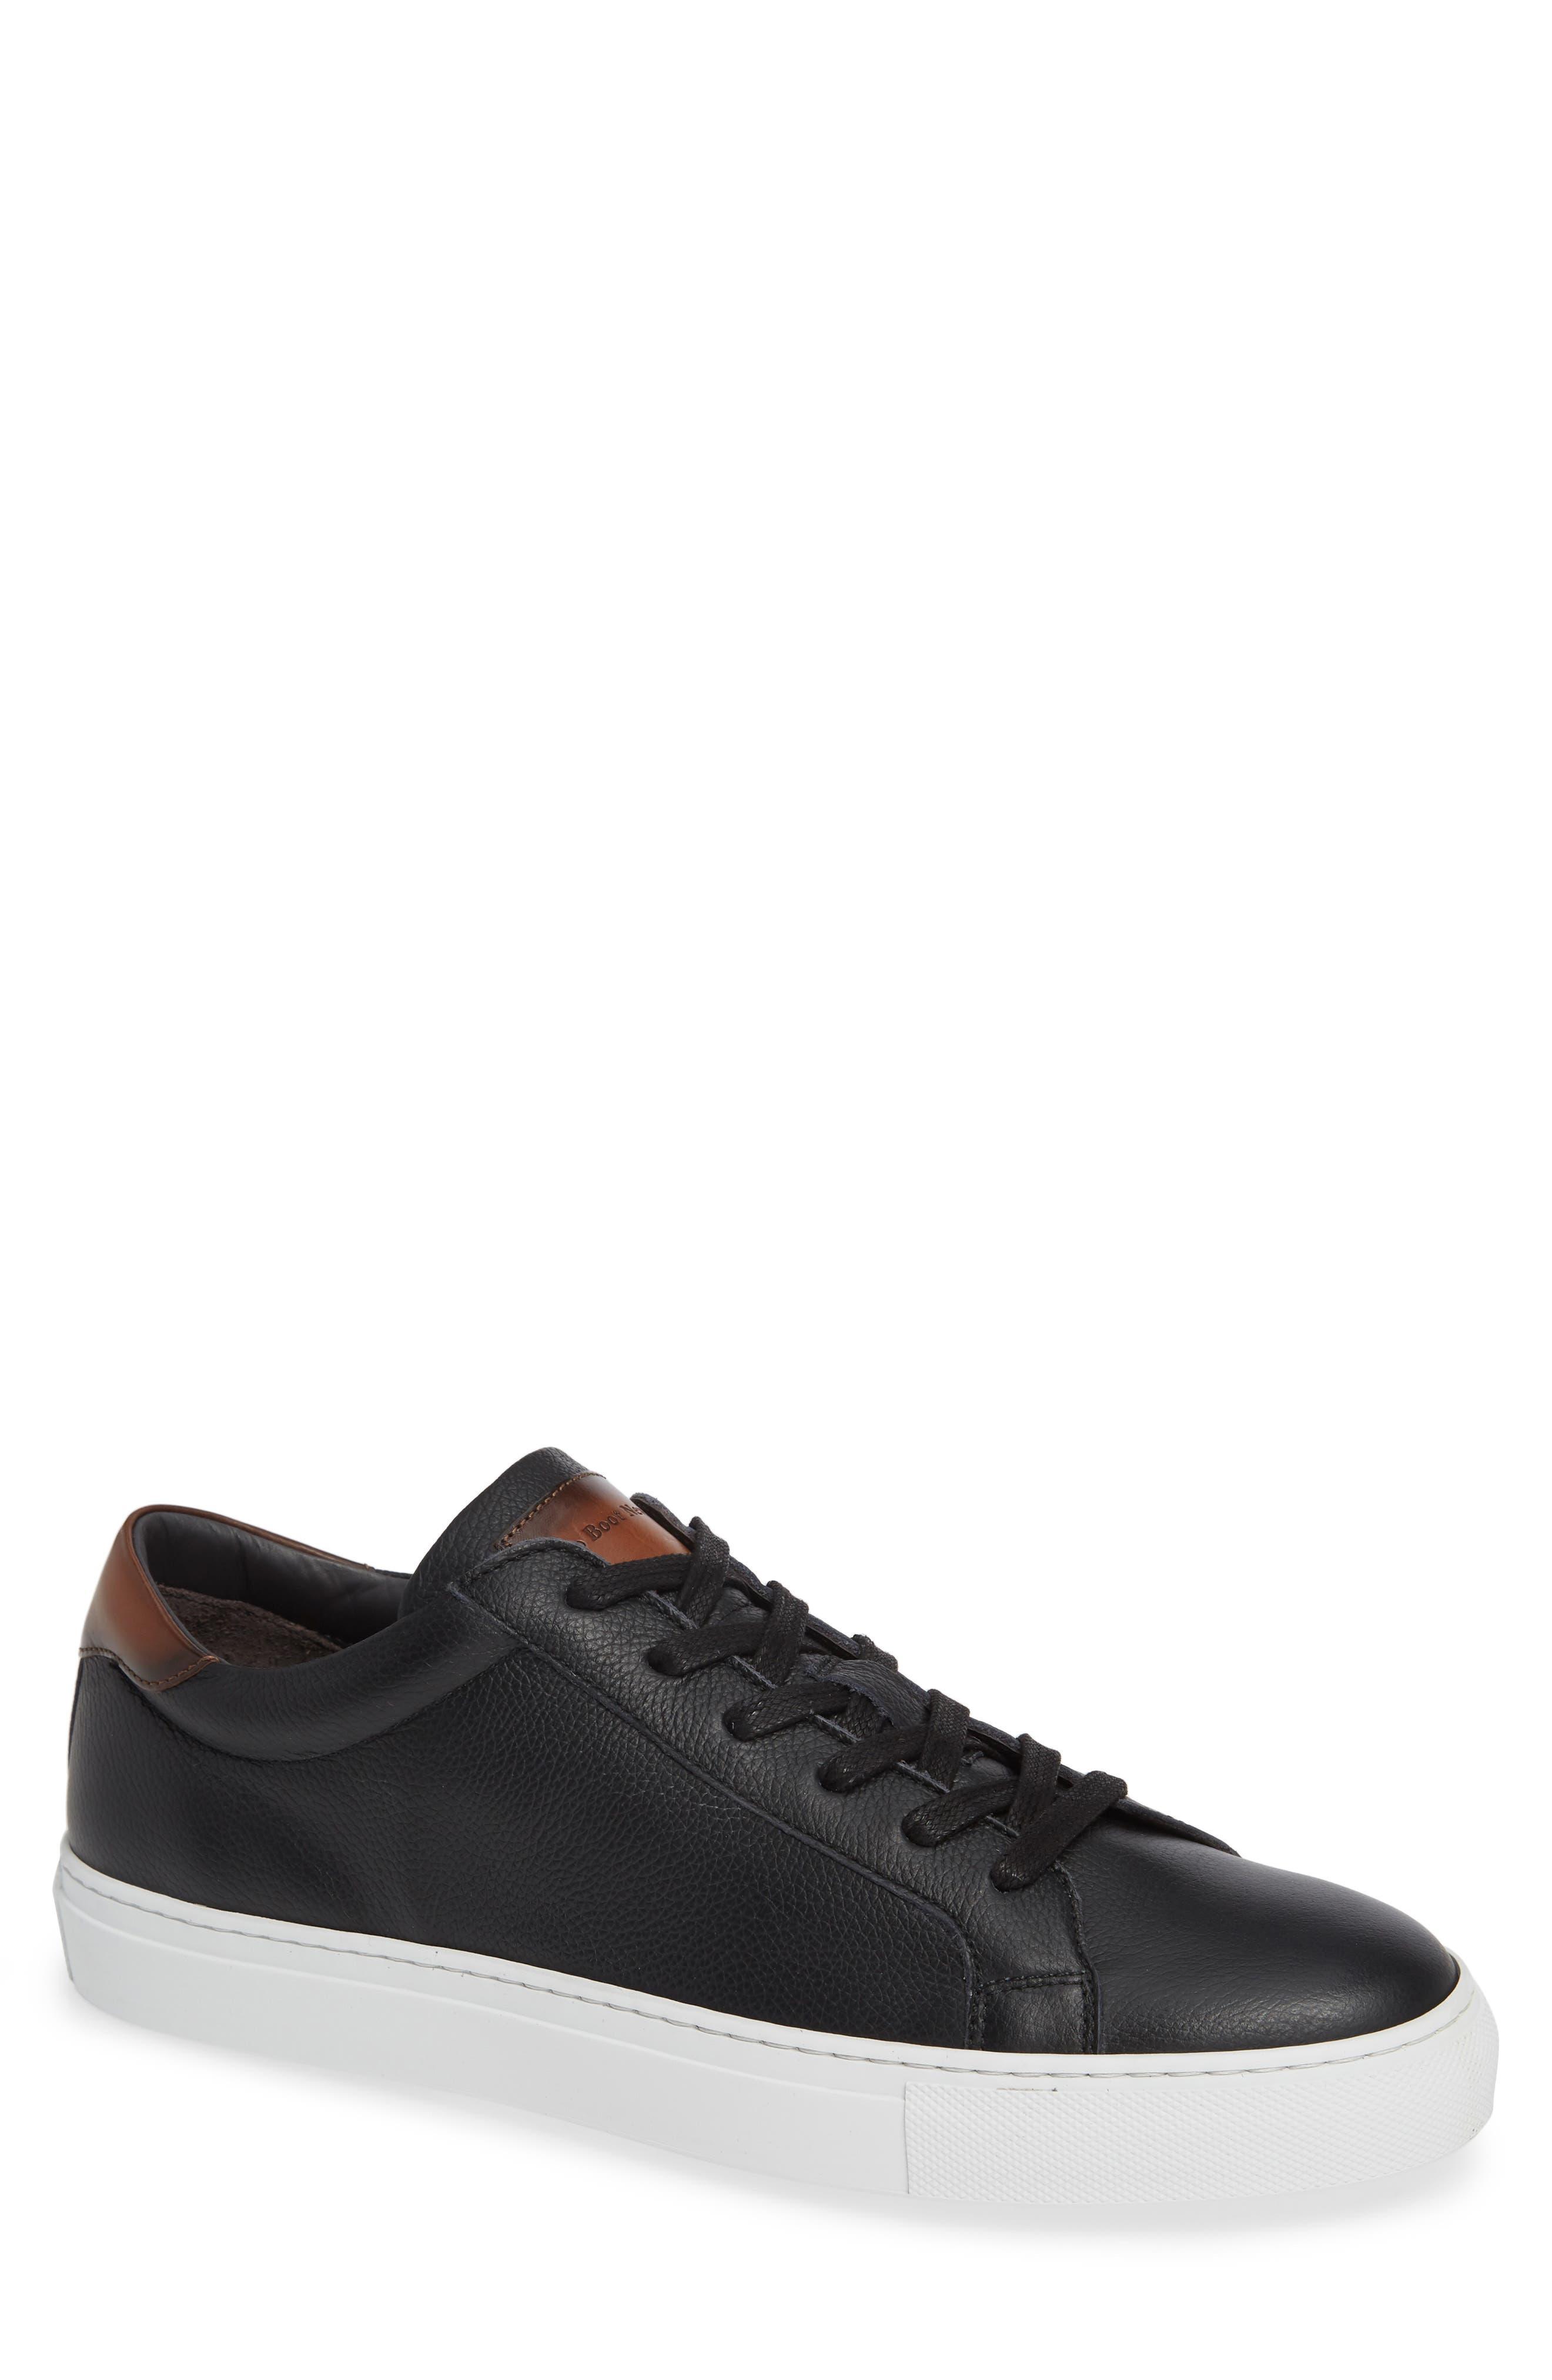 Knox Low Top Sneaker, Main, color, BLACK/ TAN LEATHER